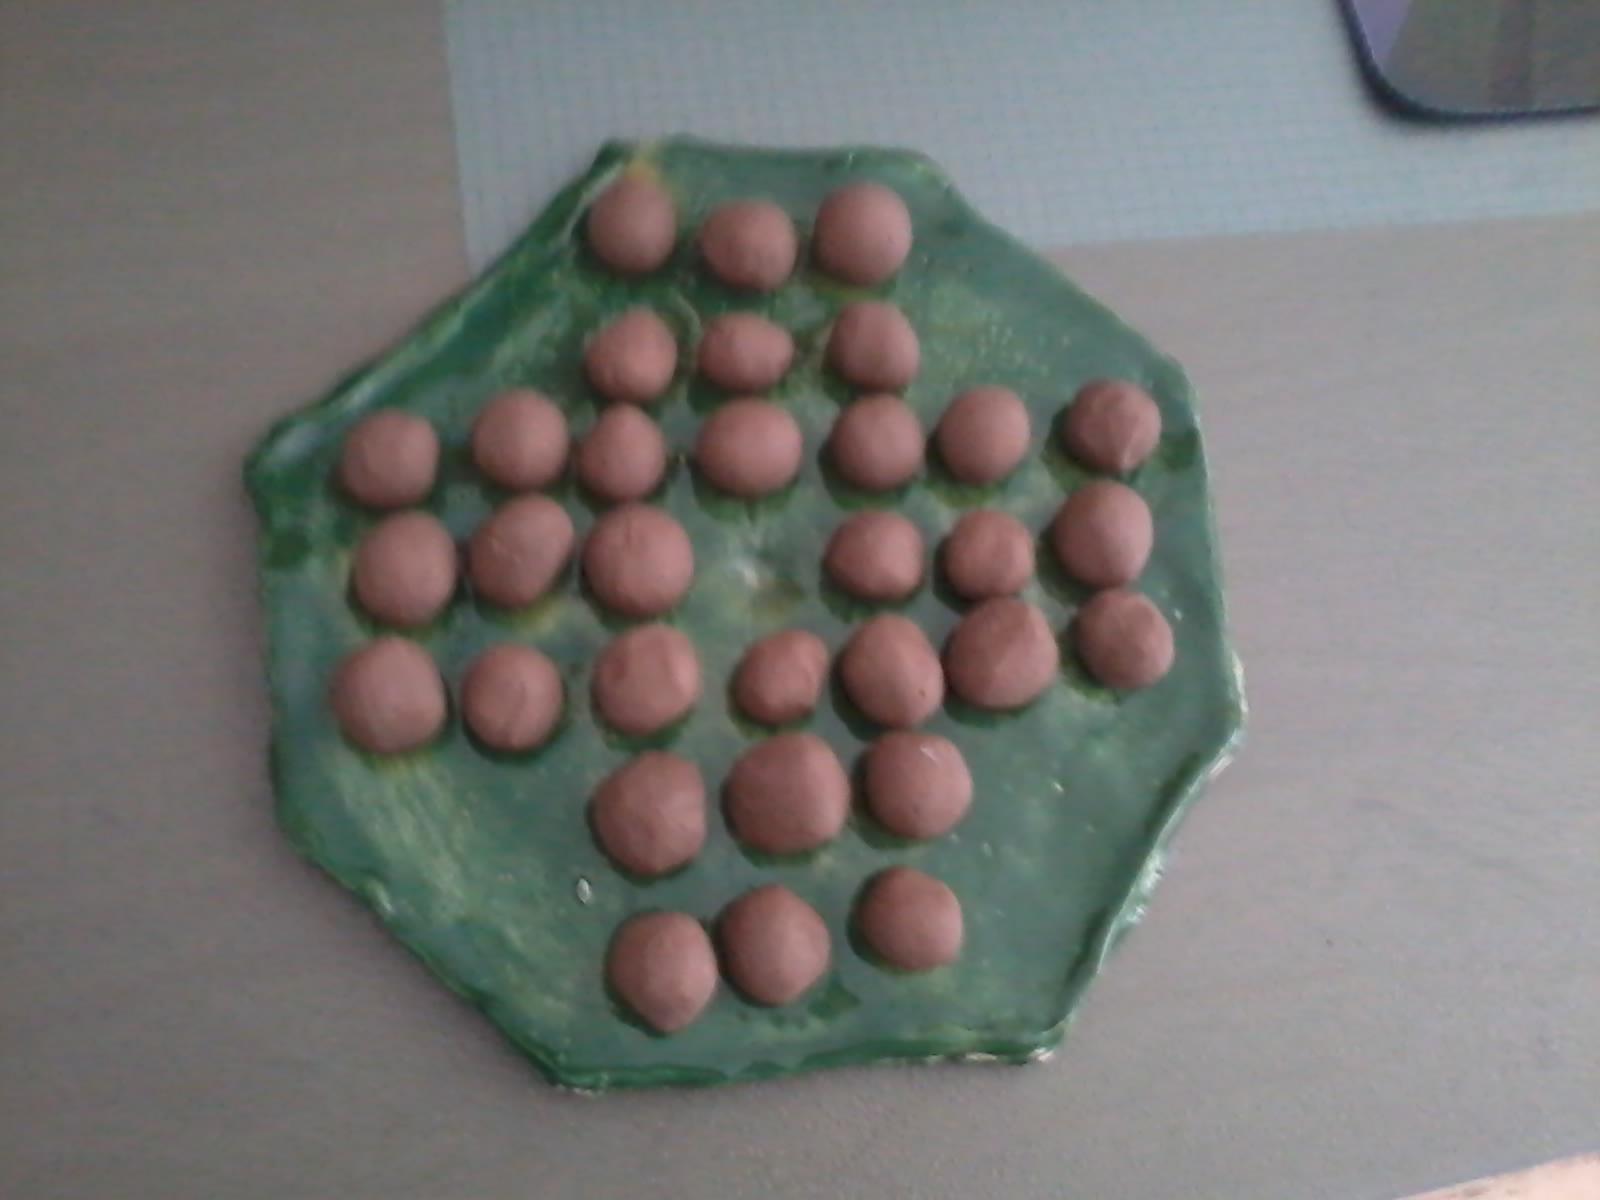 Murmelspiele Kostenlos